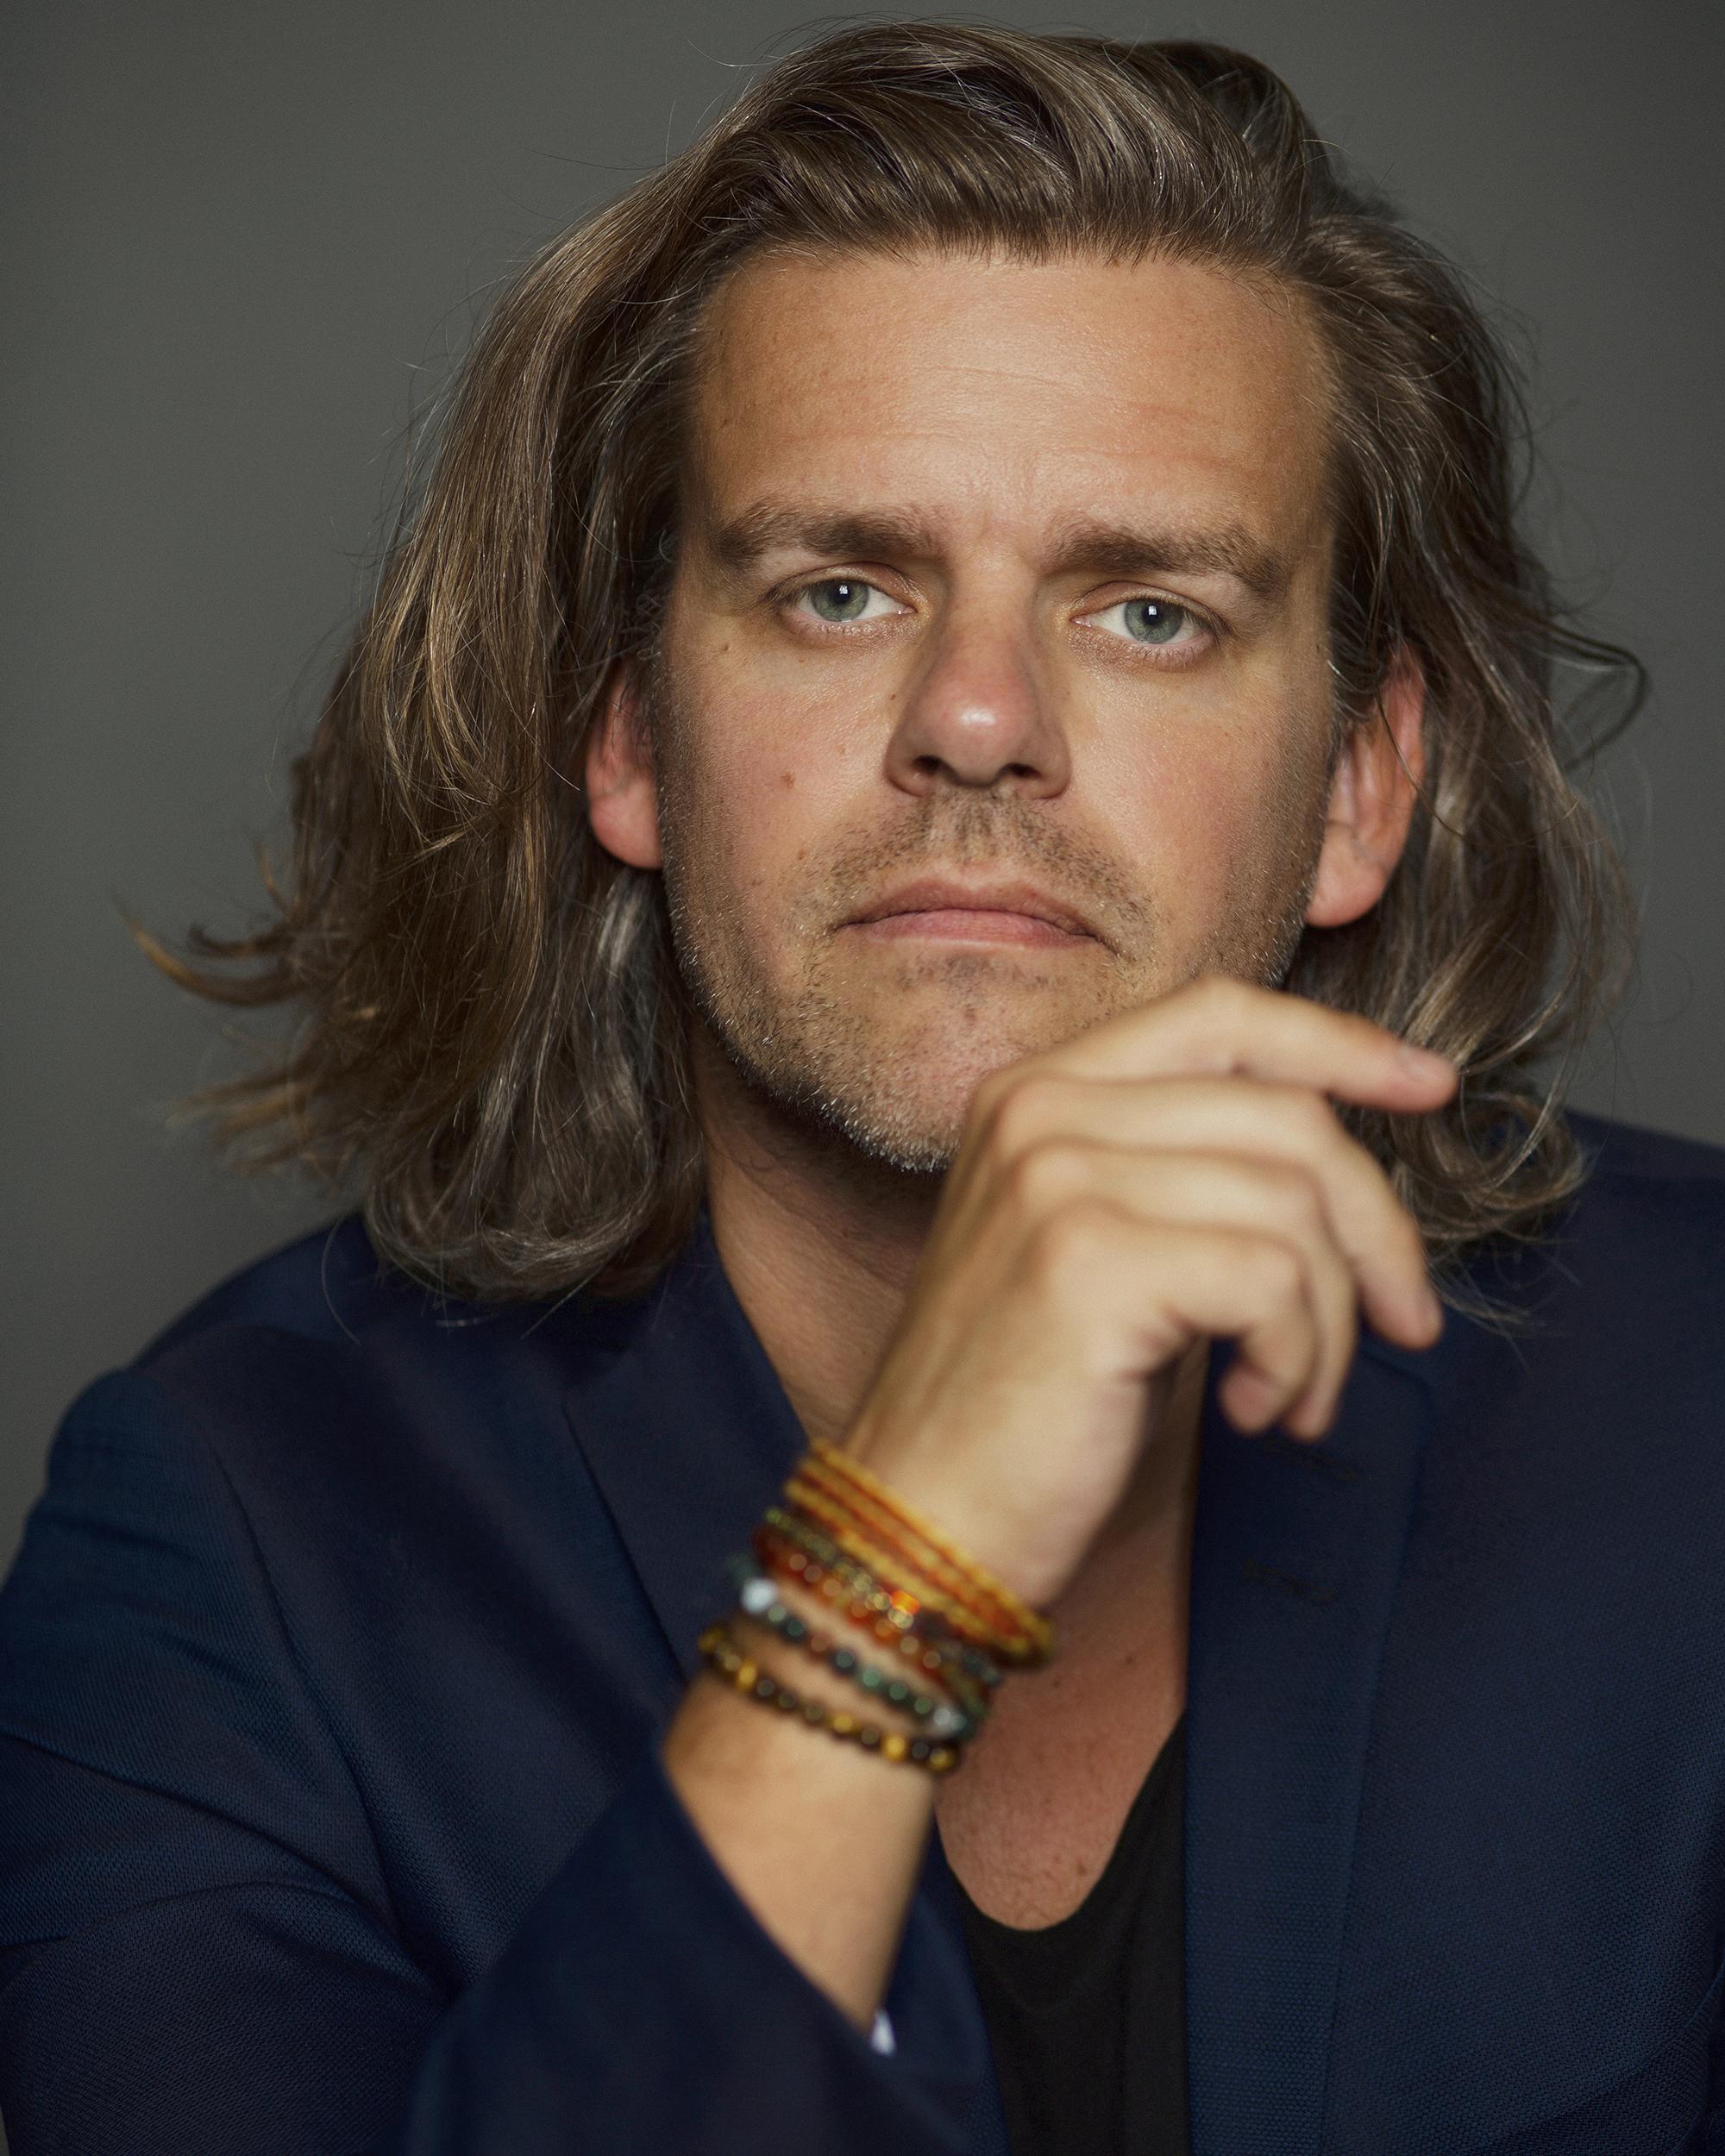 Carsten Svendsen spiller Cirkusdirektøren Far Sol. Foto: Lena Paaske